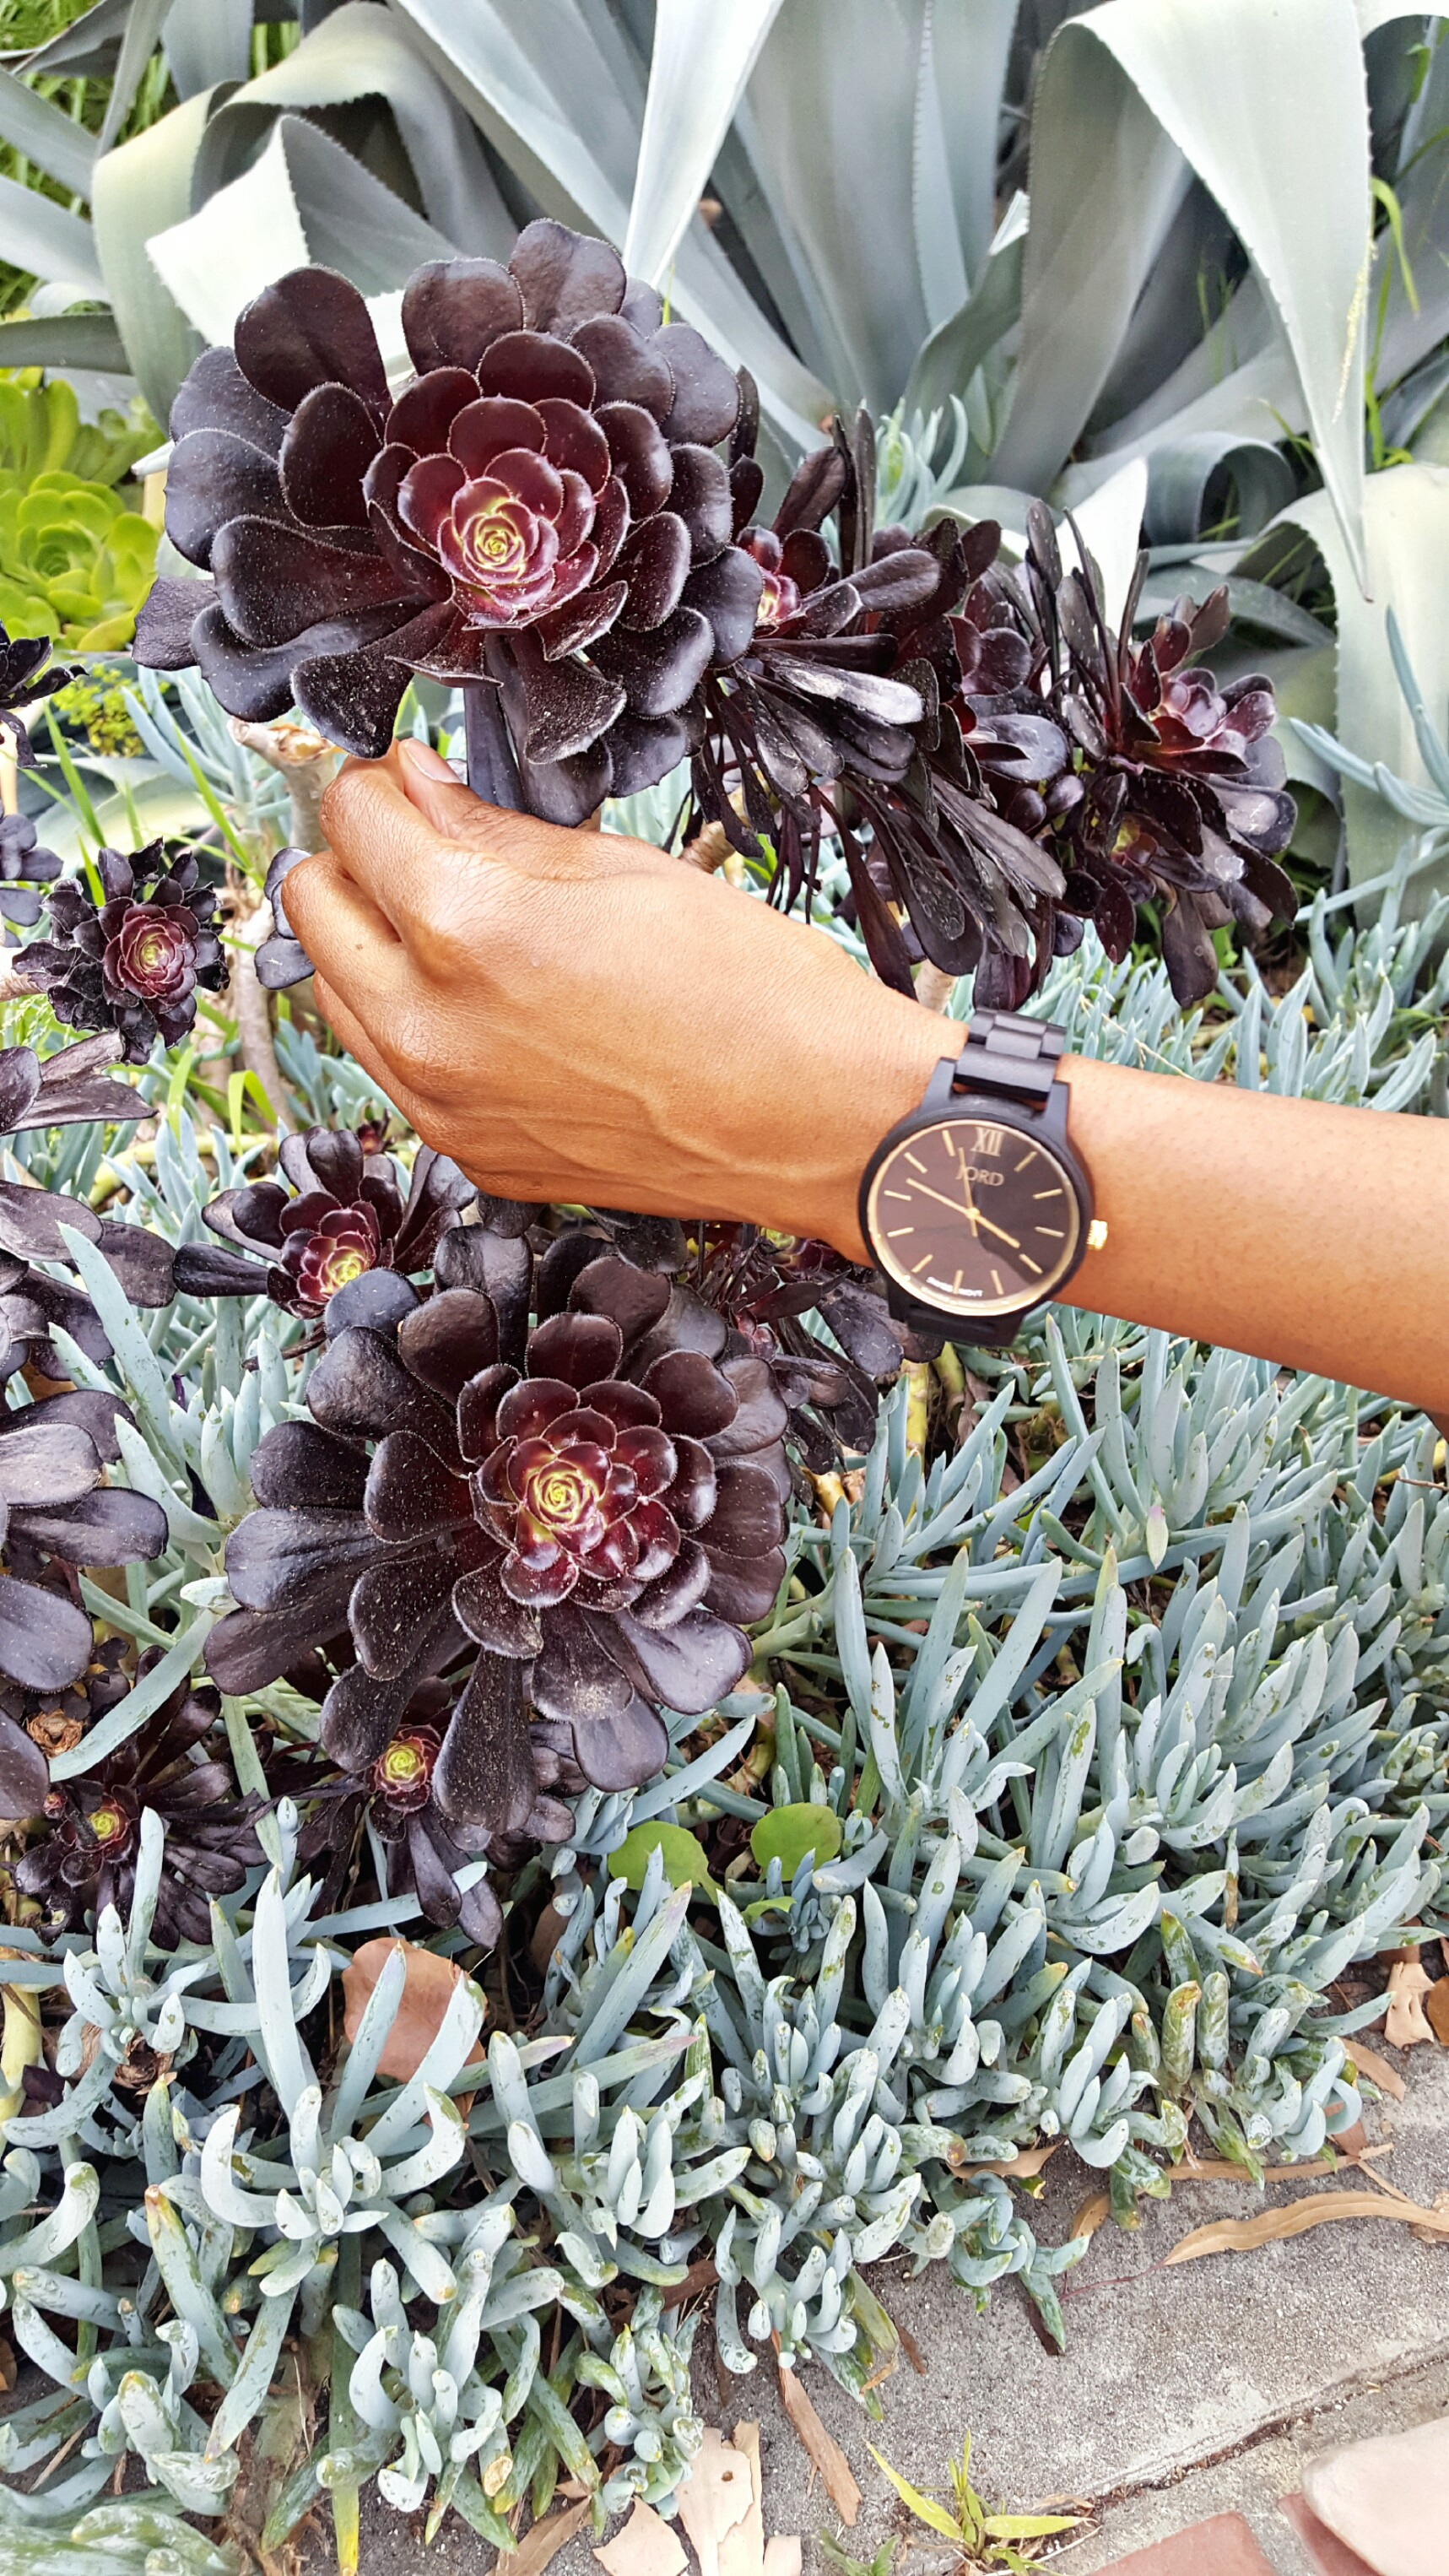 jord-ebony-and-gold-watch.jpg